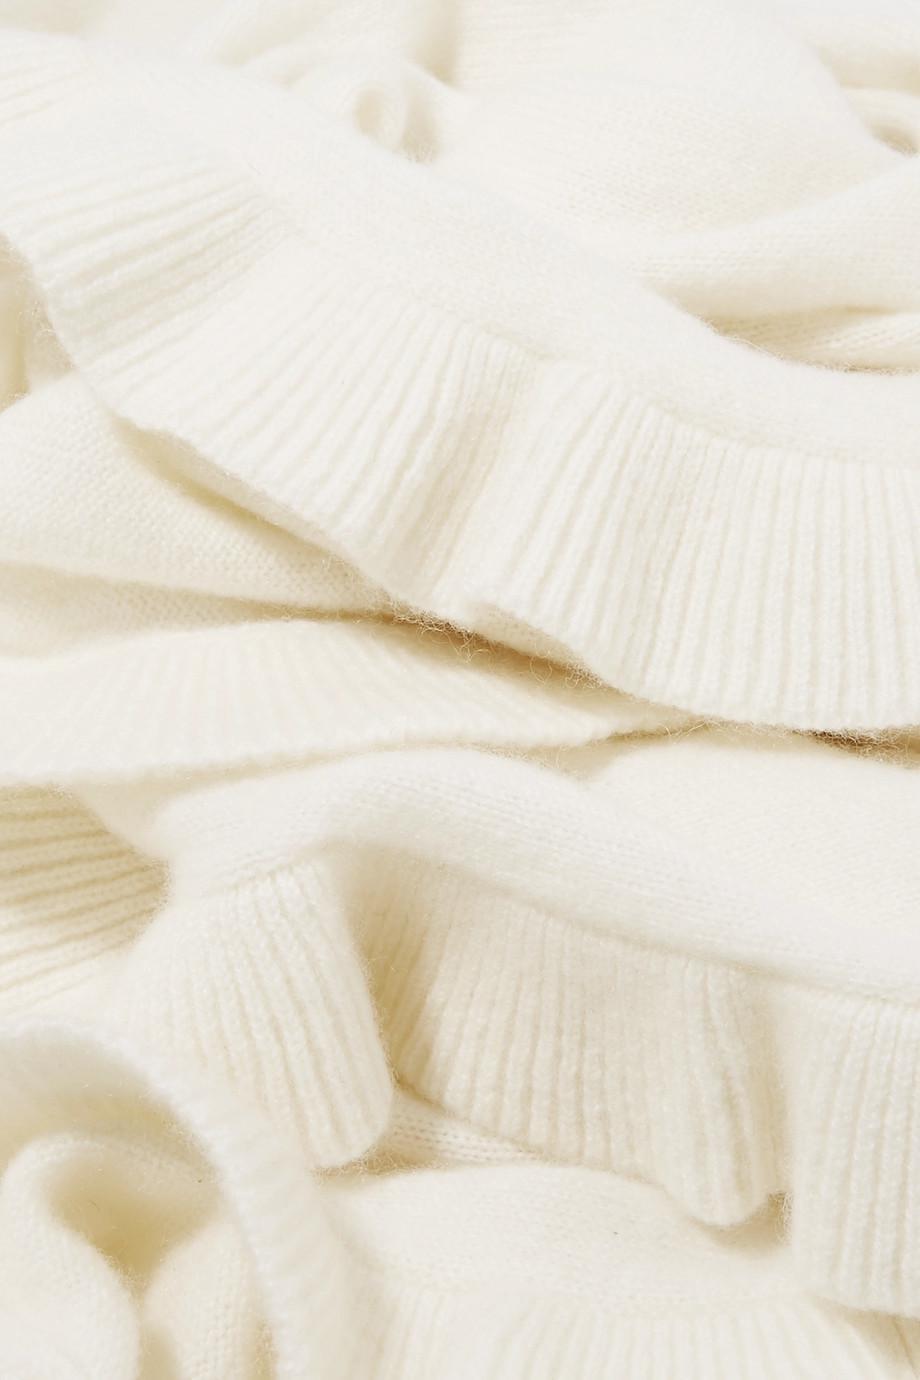 Ava Ruffled Cashmere Scarf - Off-white Madeleine Thompson 3IrHC0q